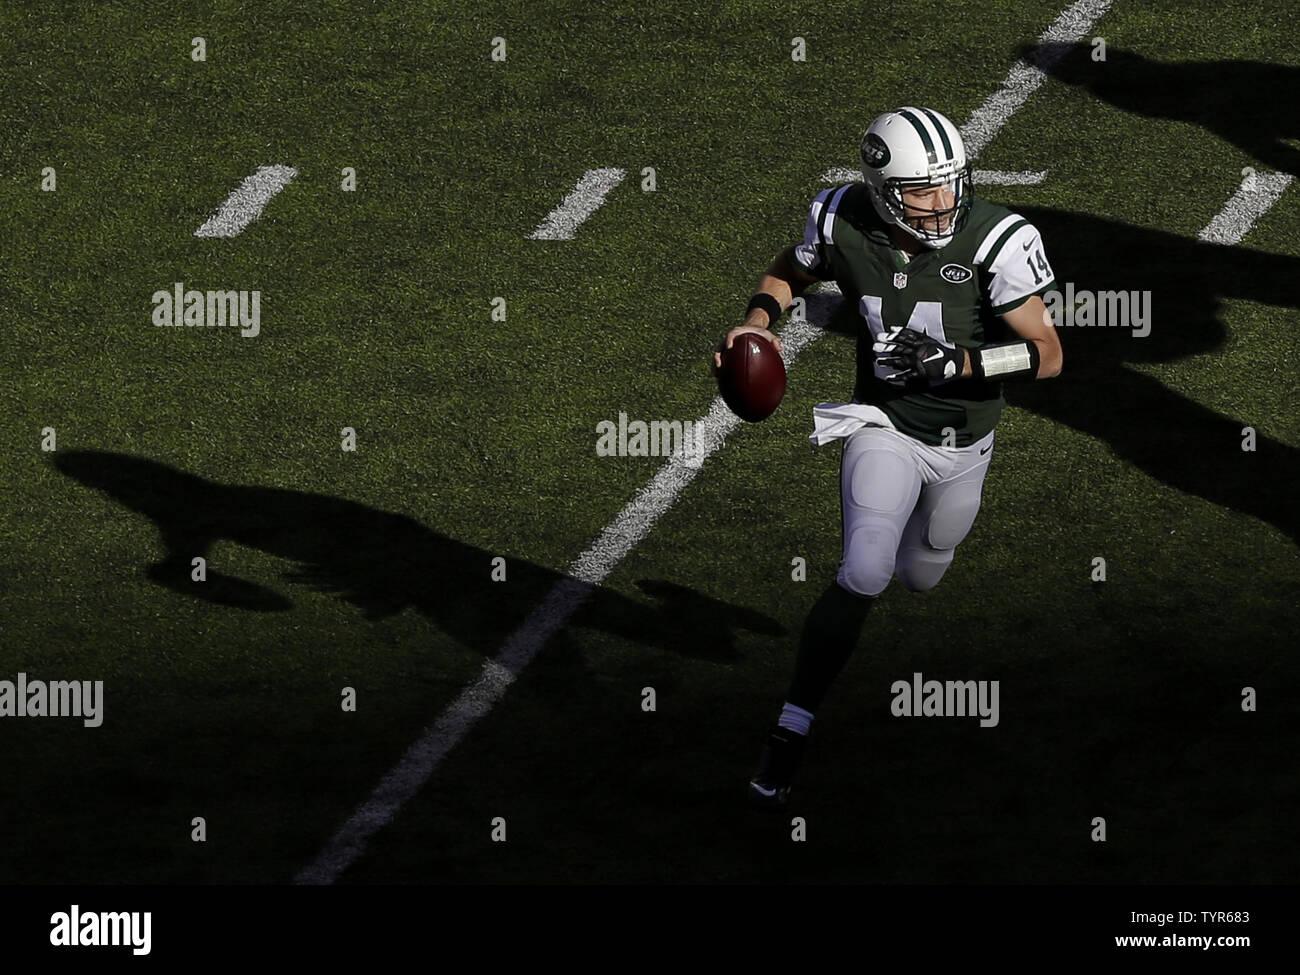 pretty nice 862f2 b708b New York Jets Ryan Fitzpatrick scrambles with the football ...